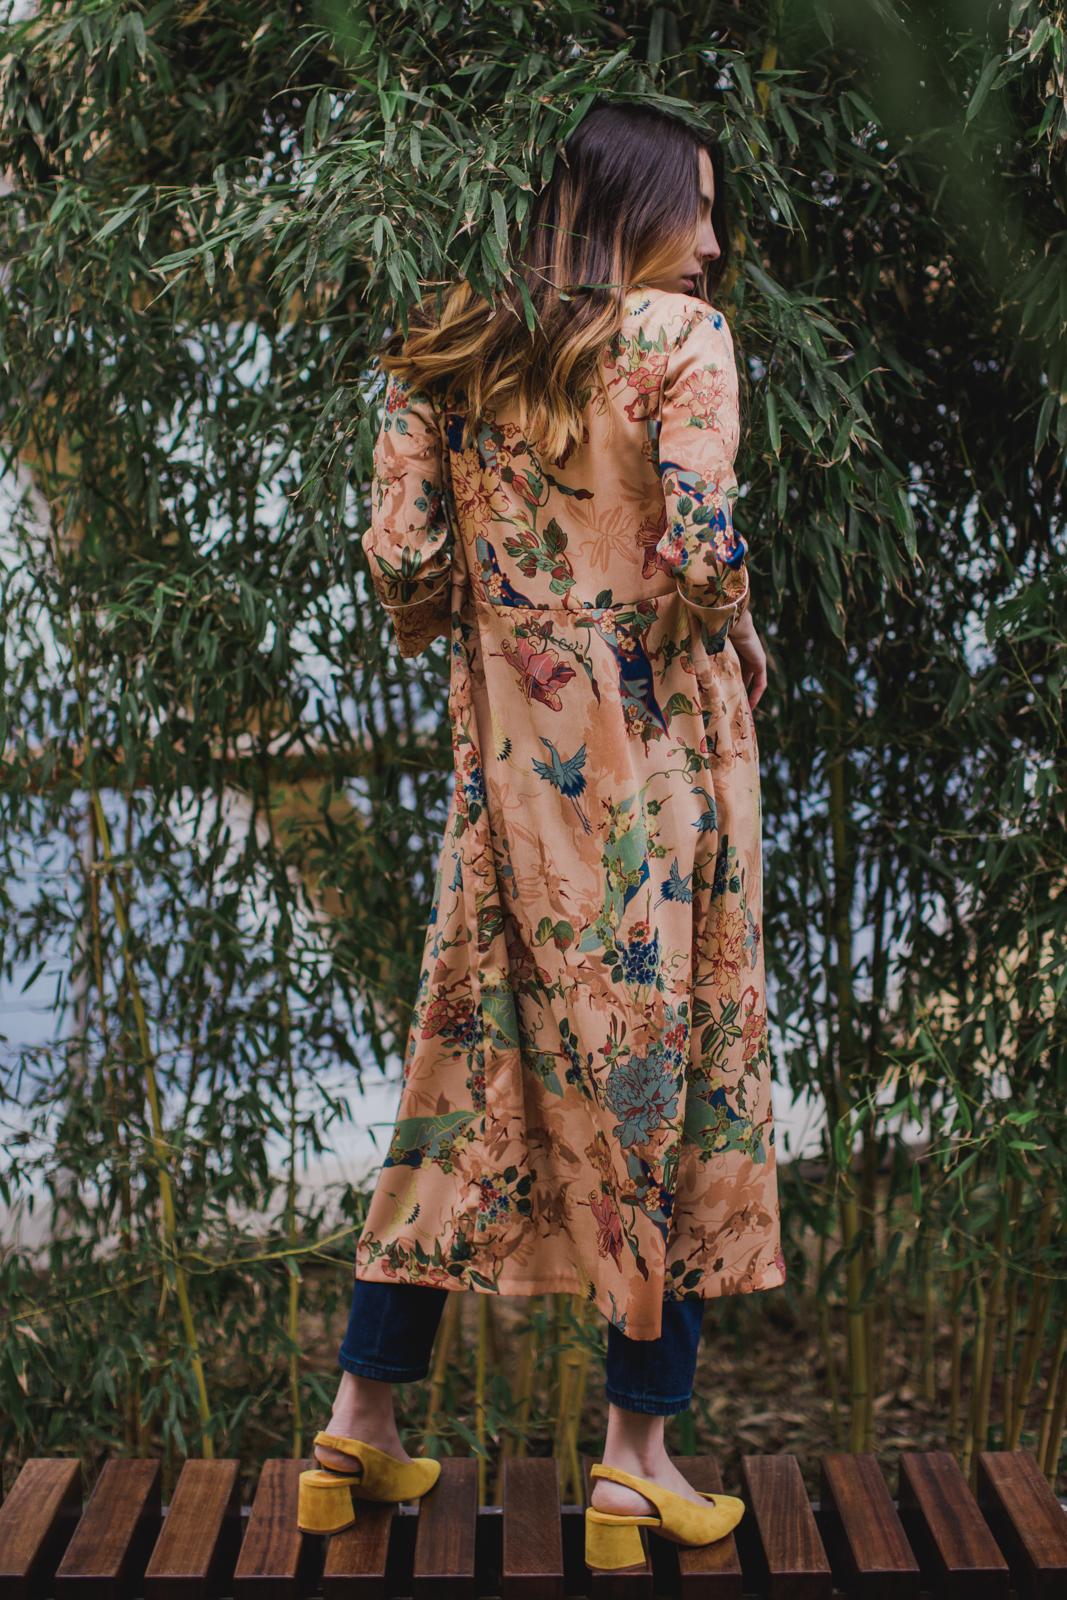 fashion-photographer-london-fashionstory-jasmina-haskovic-minas-planet-uk6.jpg